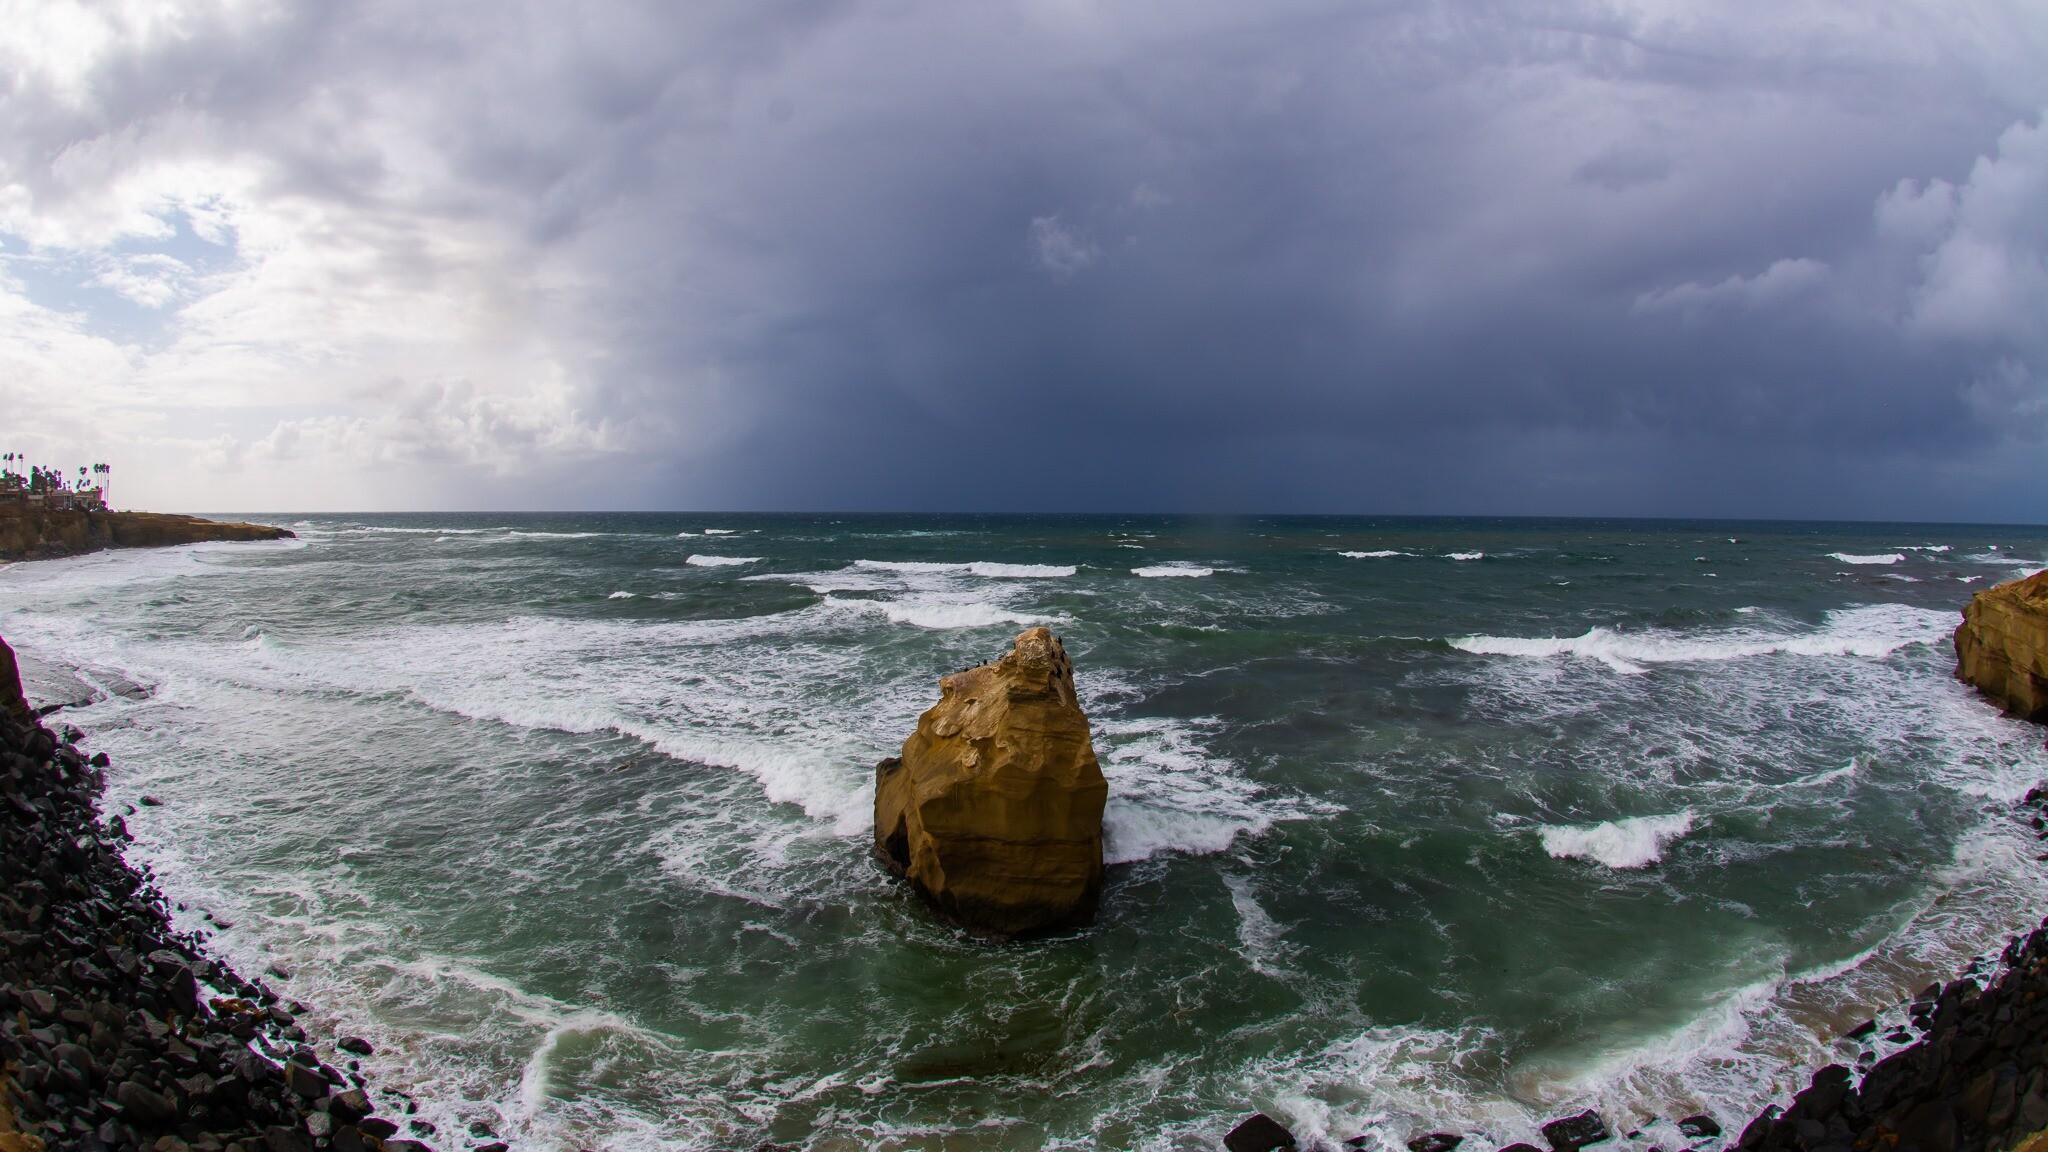 sunset cliffs rain_jim grant 1.jpg